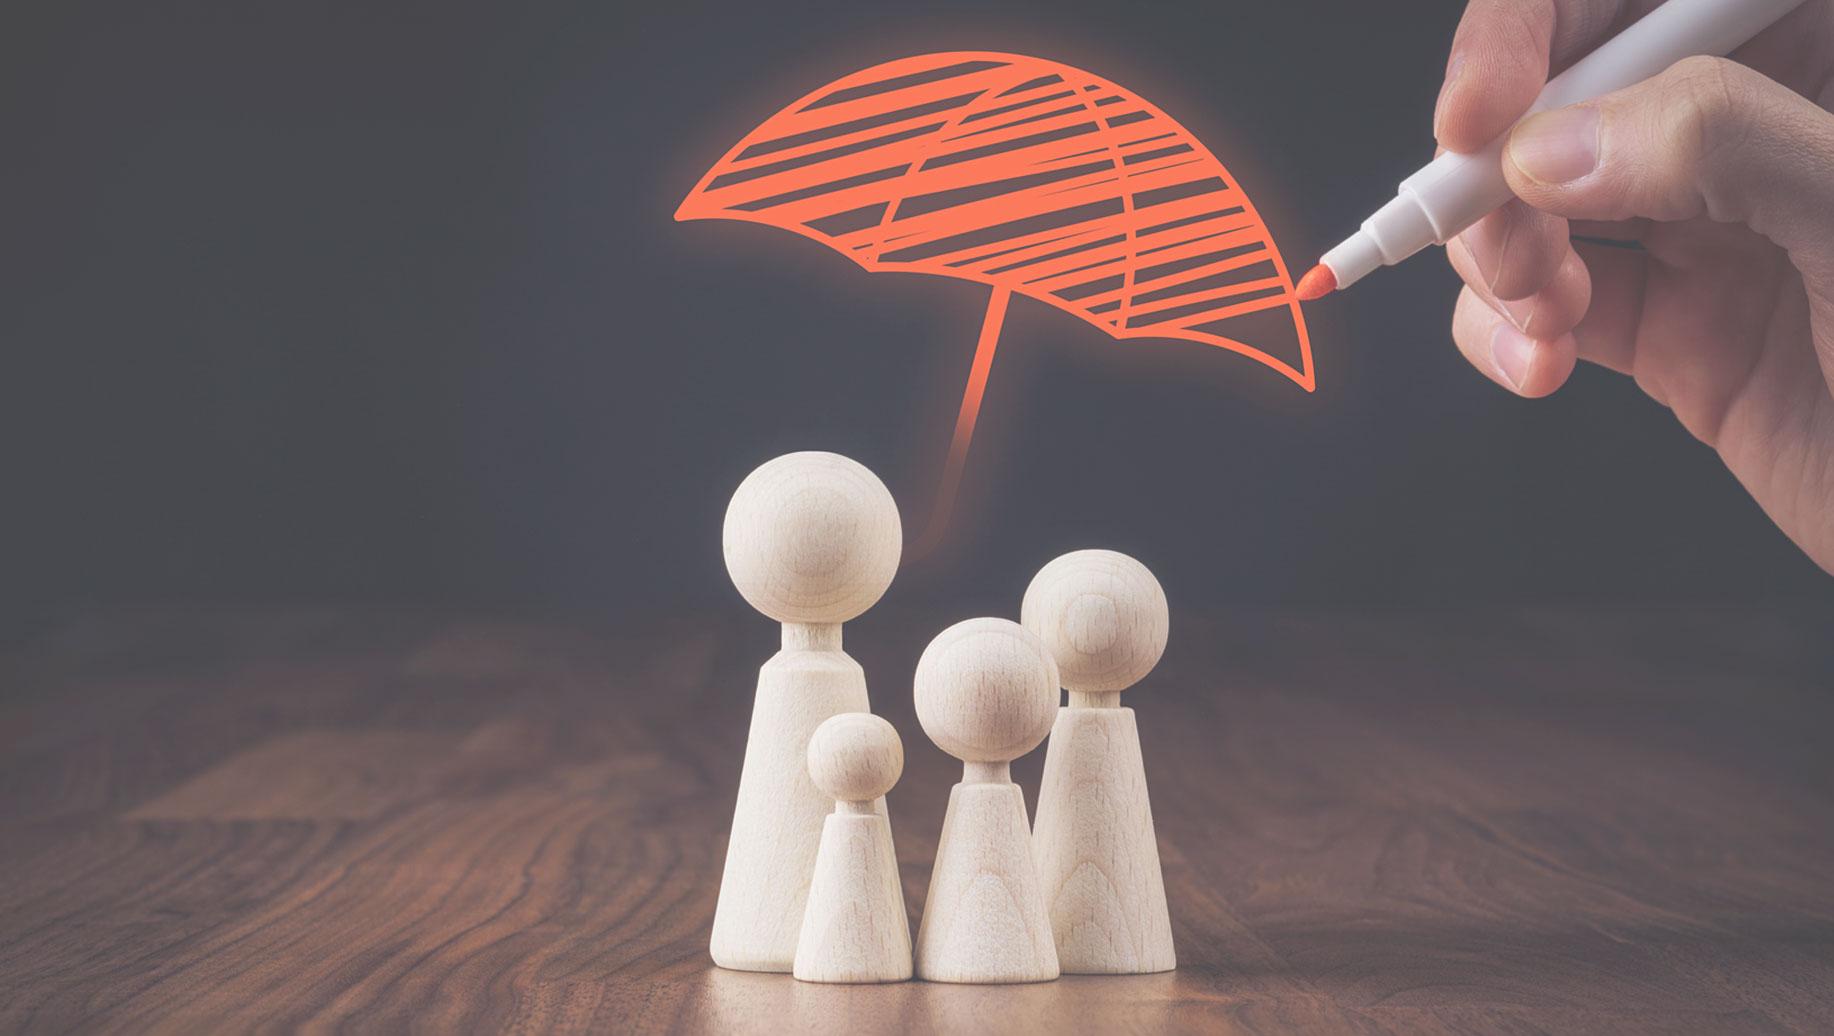 Life Insurance Sales Ideas, Tips, & Techniques